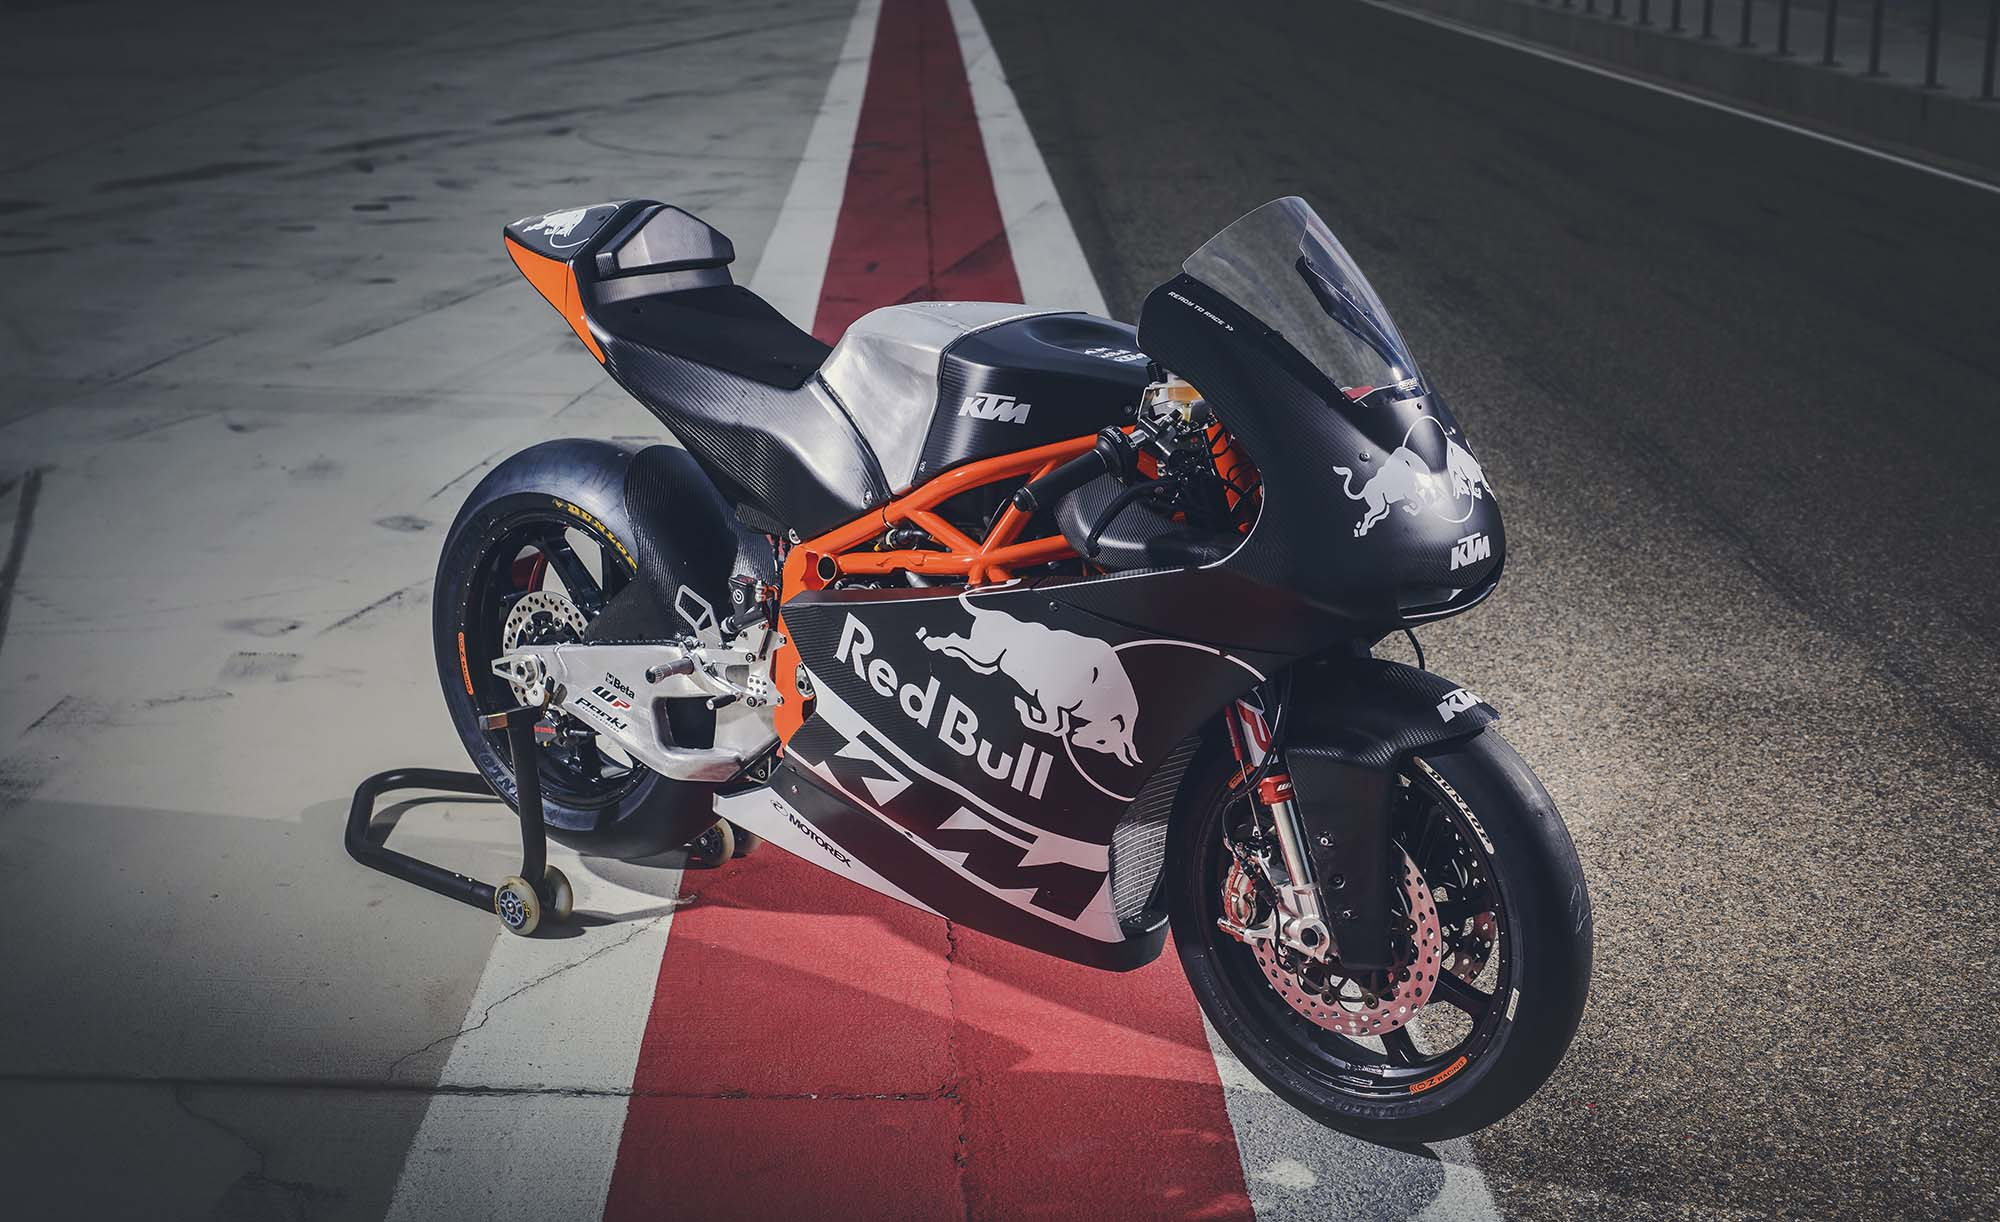 KTM Moto2 is ready to race - BikesRepublic